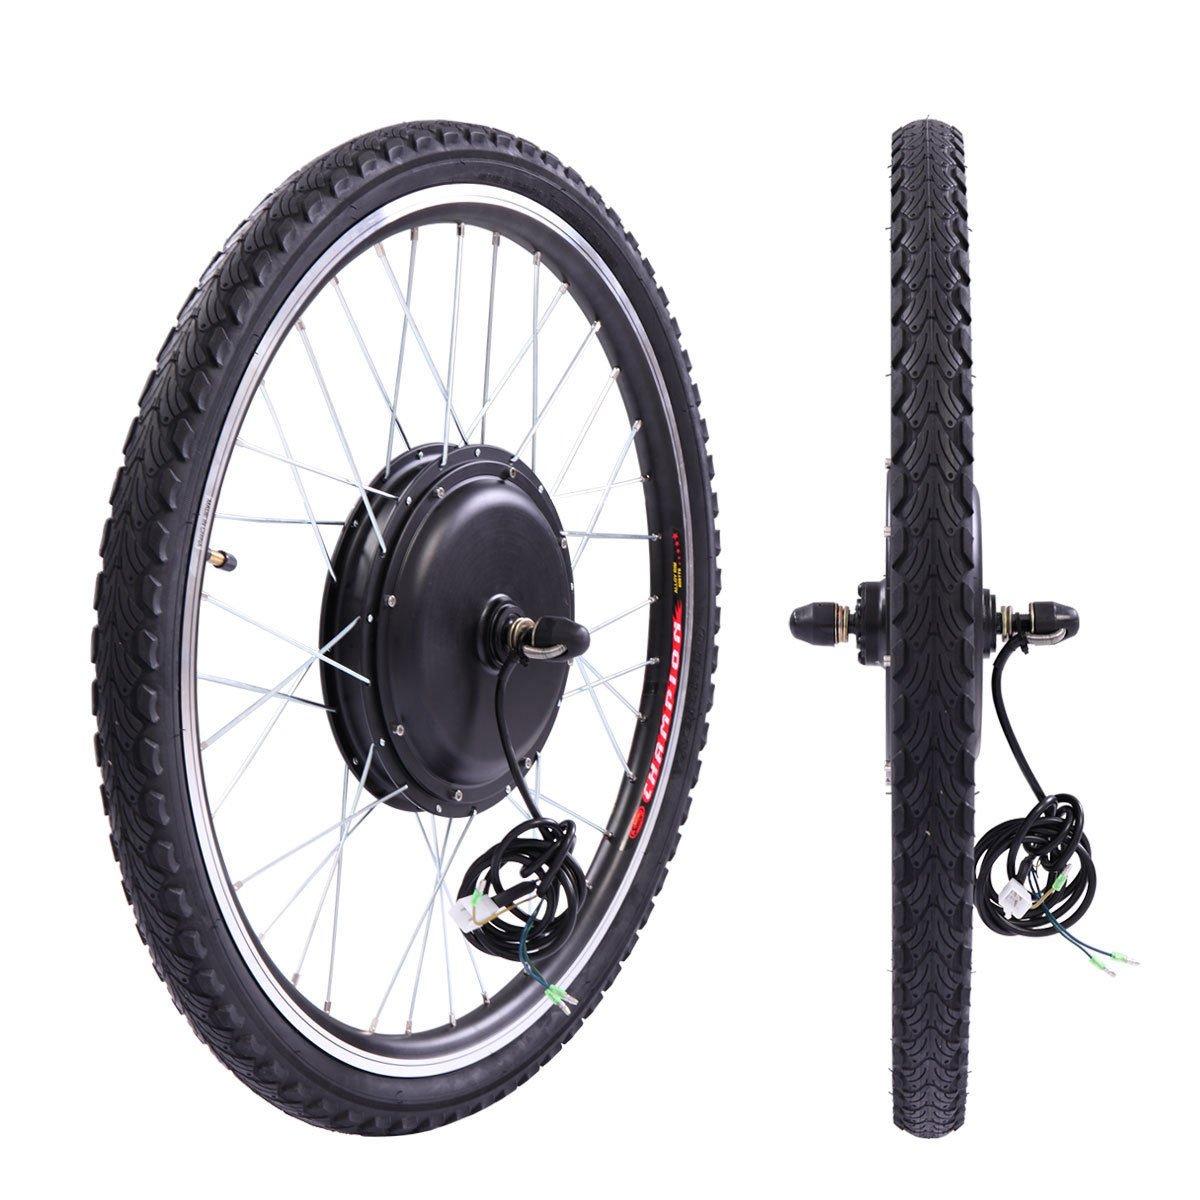 JAXPETY 36V 500W Electric Bicycle Cycle 26'' E Bike Front Wheel Ebike Hub Motor Conversion Kit Hub Motor Wheel by JAXPETY (Image #3)